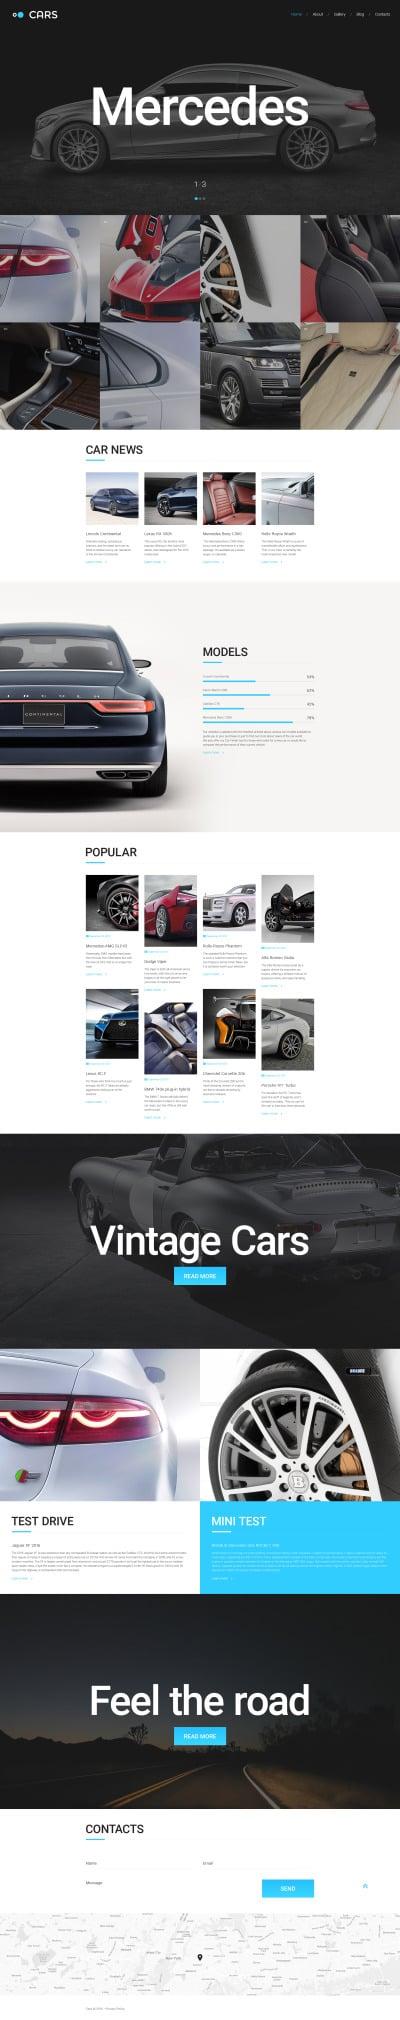 Адаптивный HTML шаблон №57615 на тему автомобиль